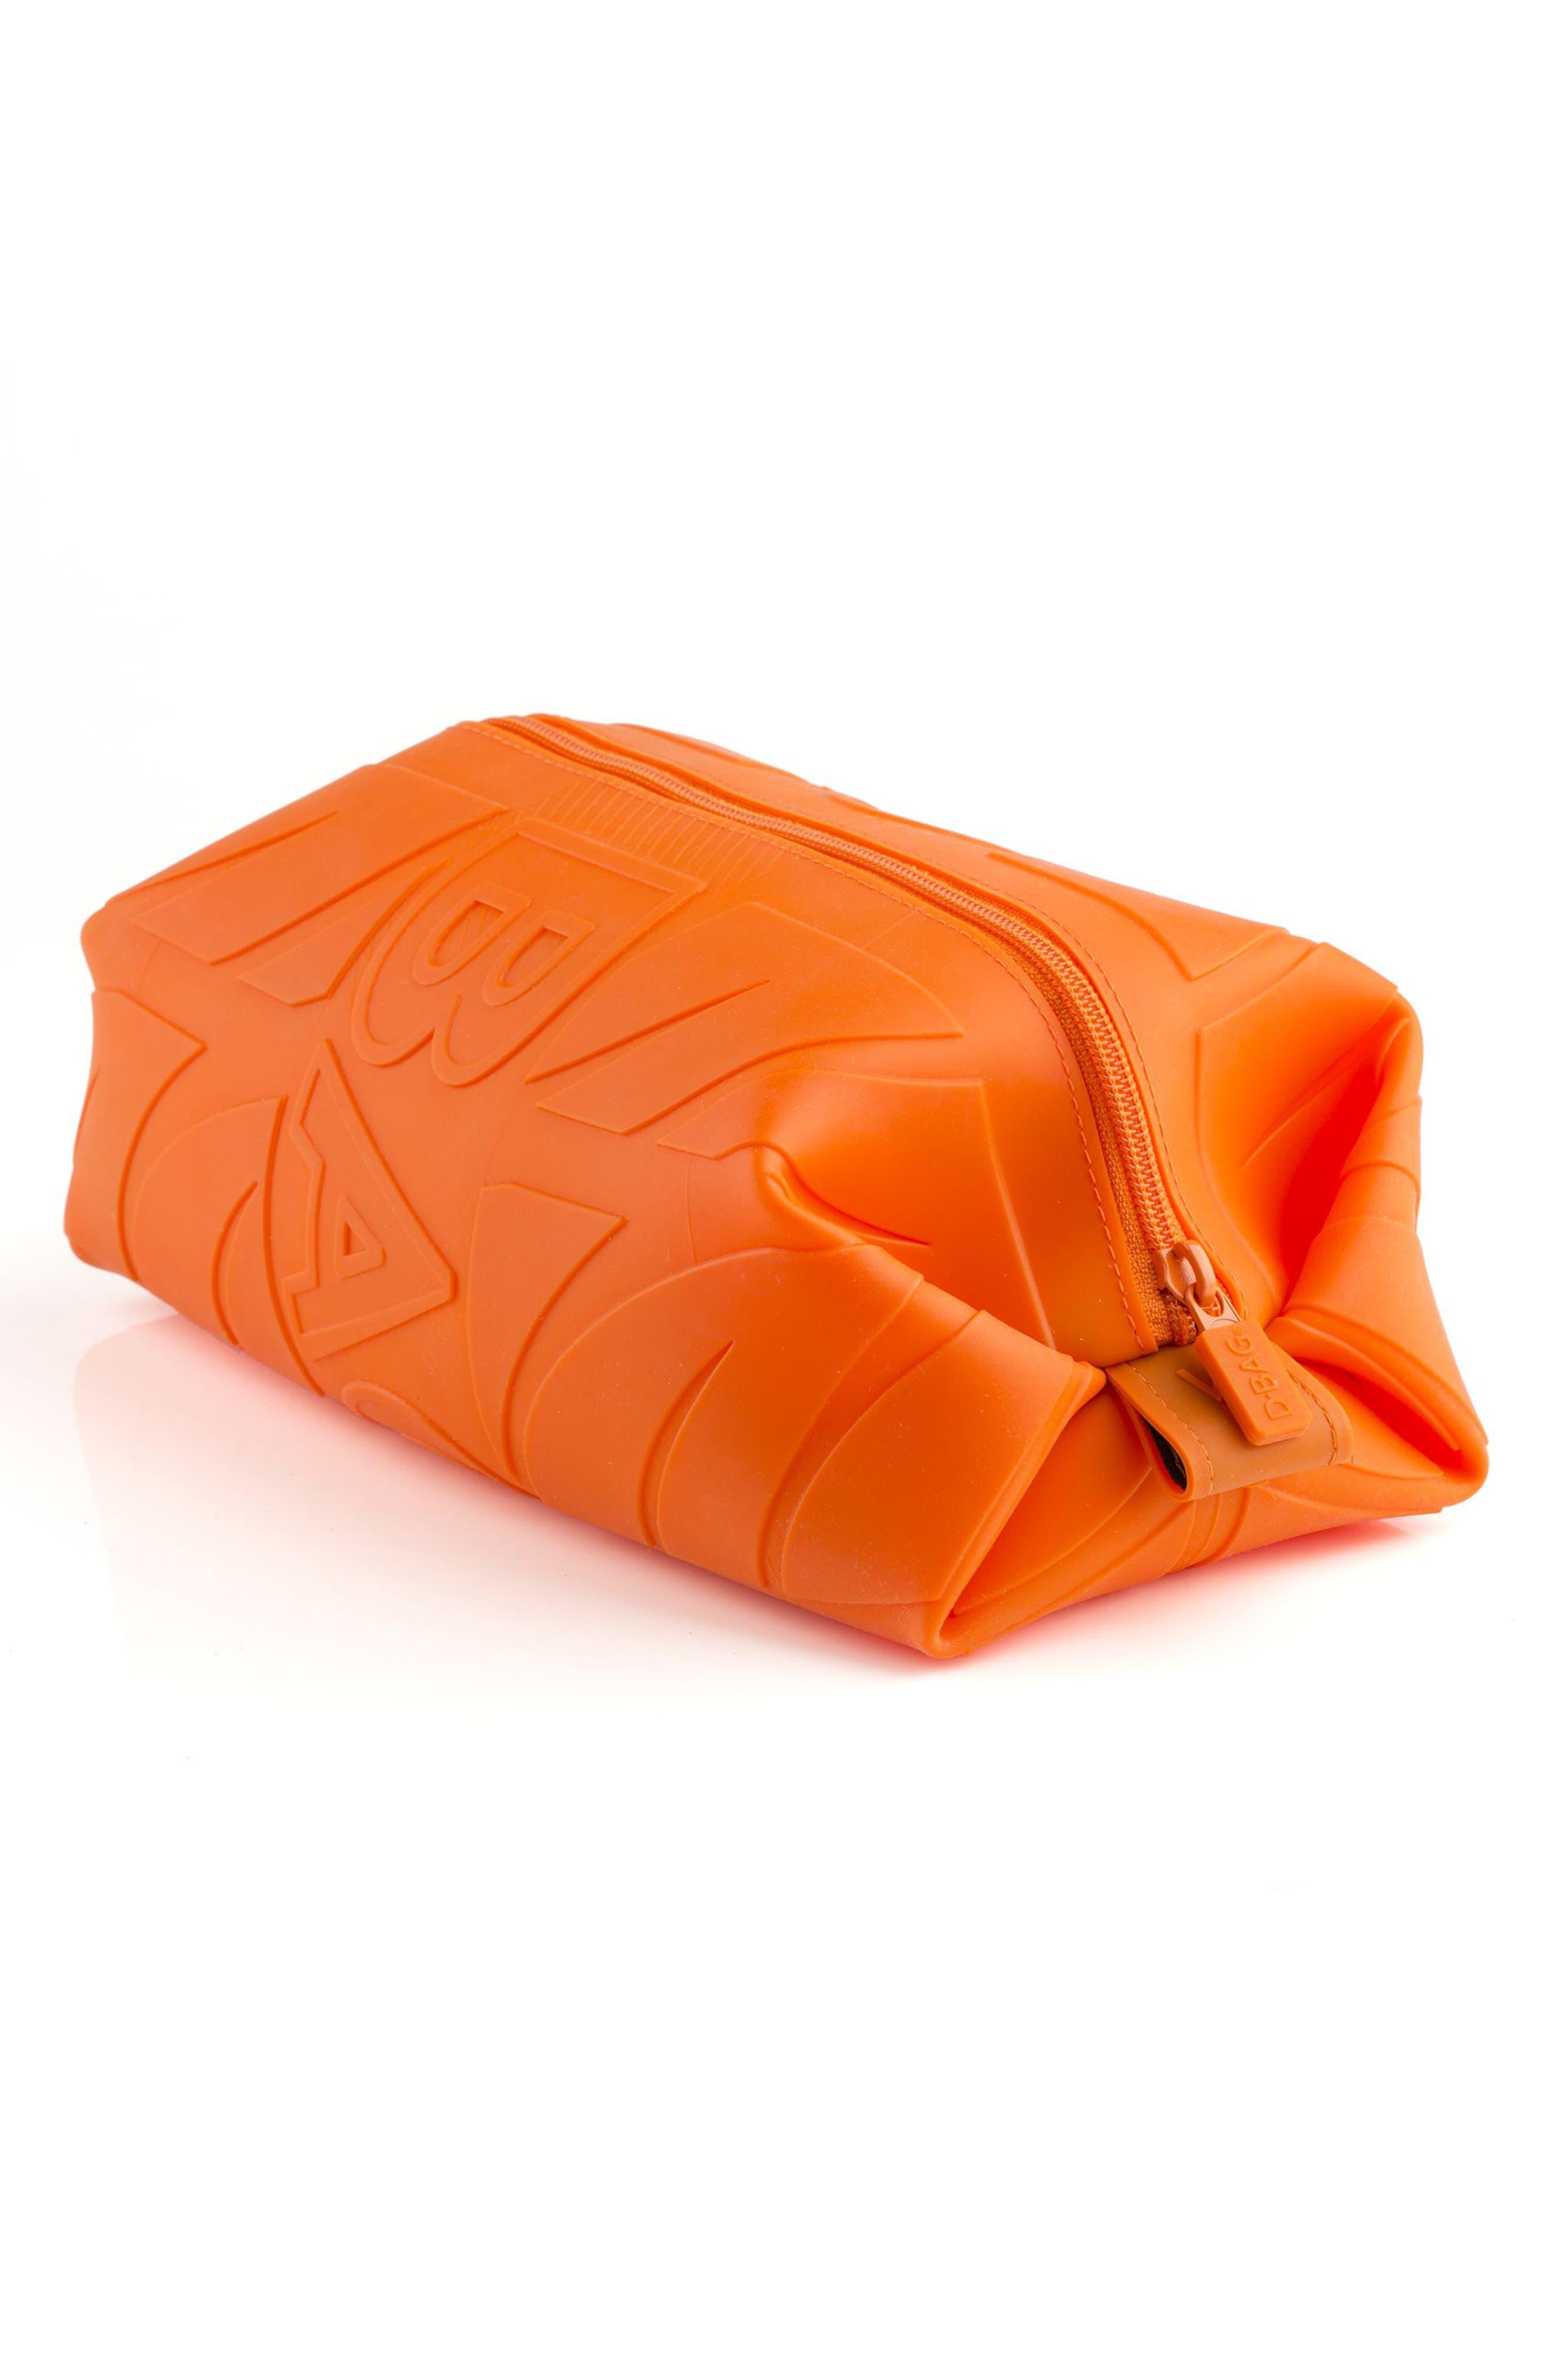 Silicone Travel Kit,                             Alternate thumbnail 3, color,                             Orange